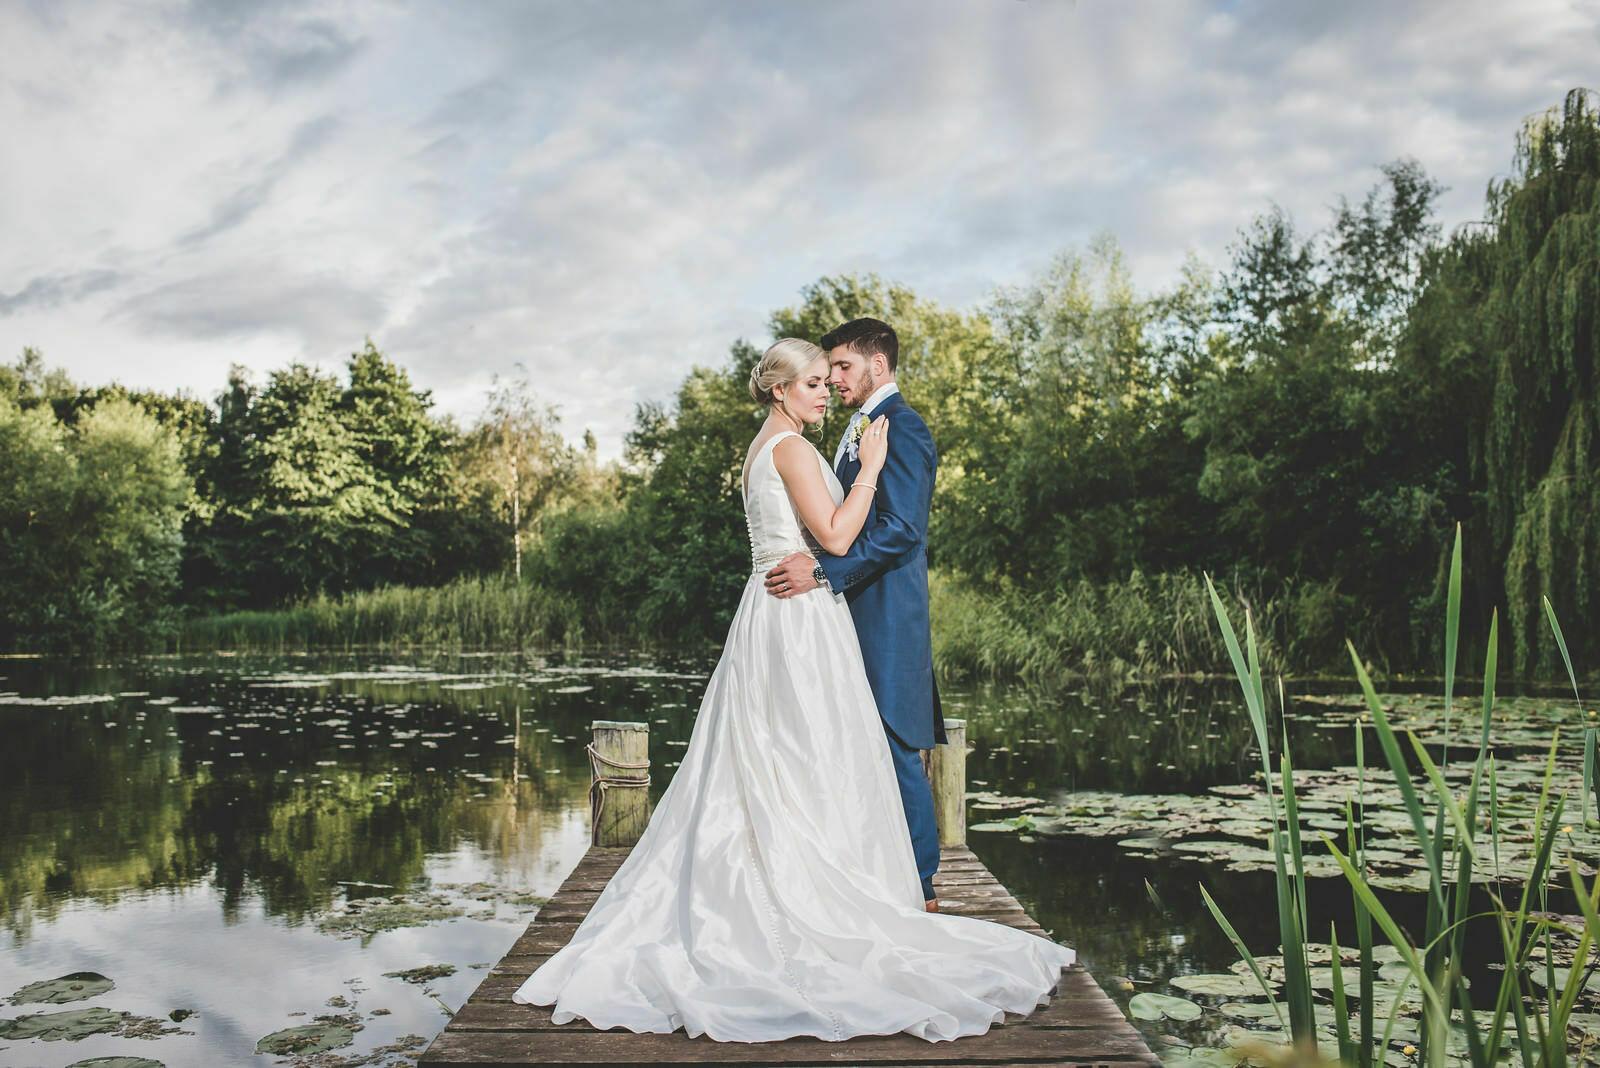 Lyde arundel wedding